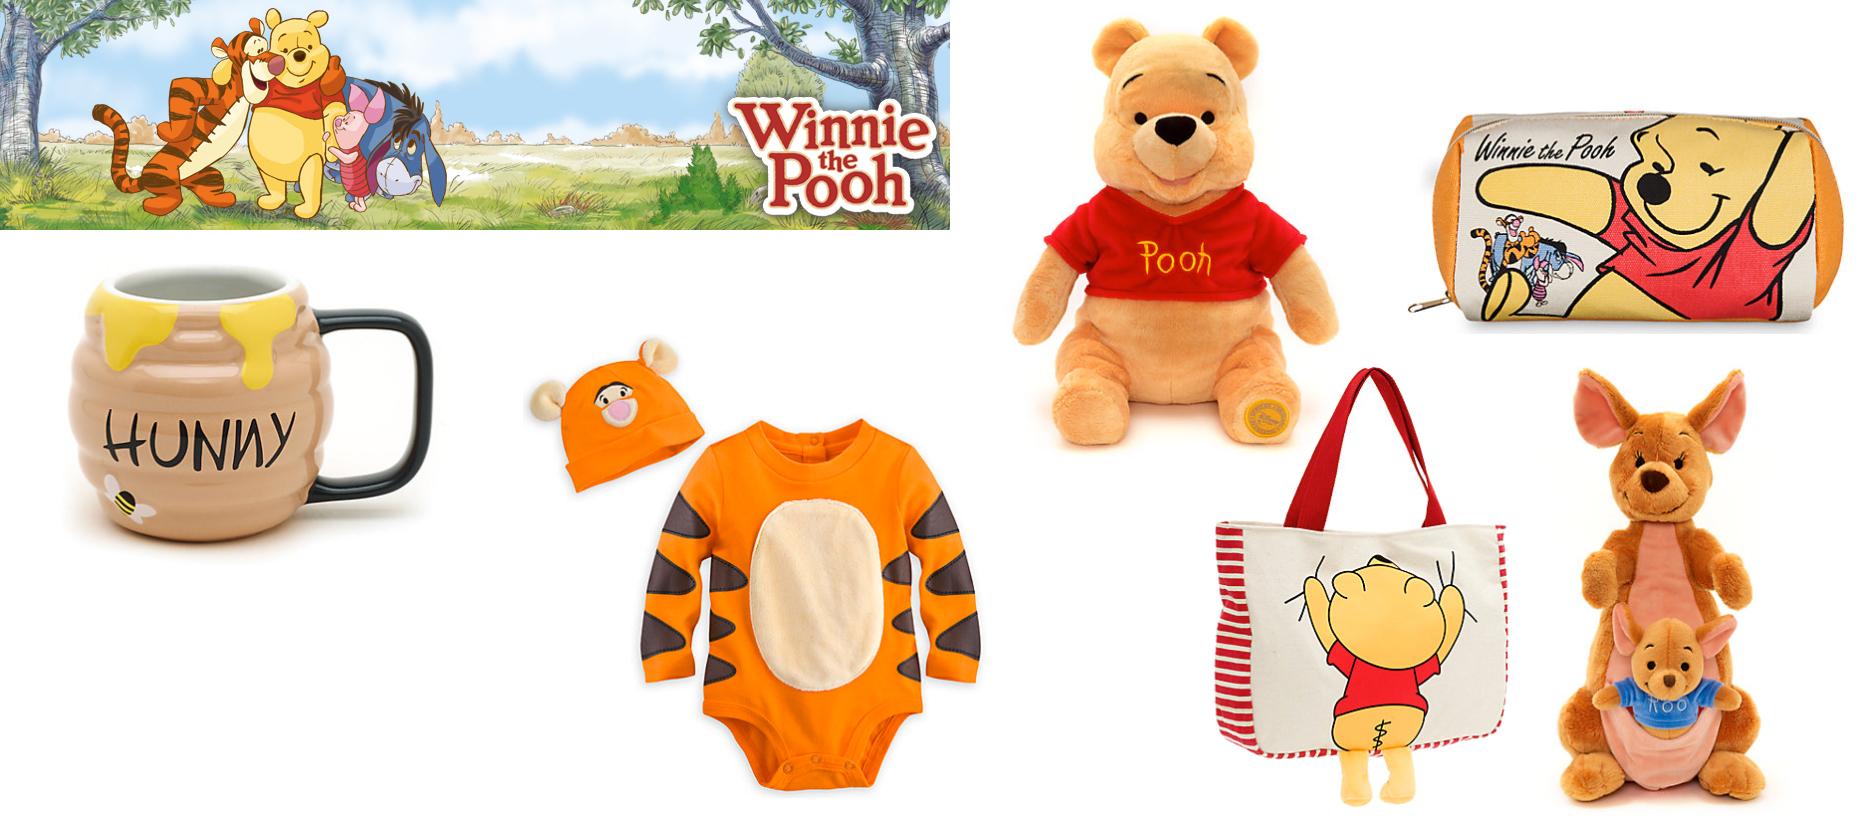 Ideas de regalo Winnie the Pooh Disney